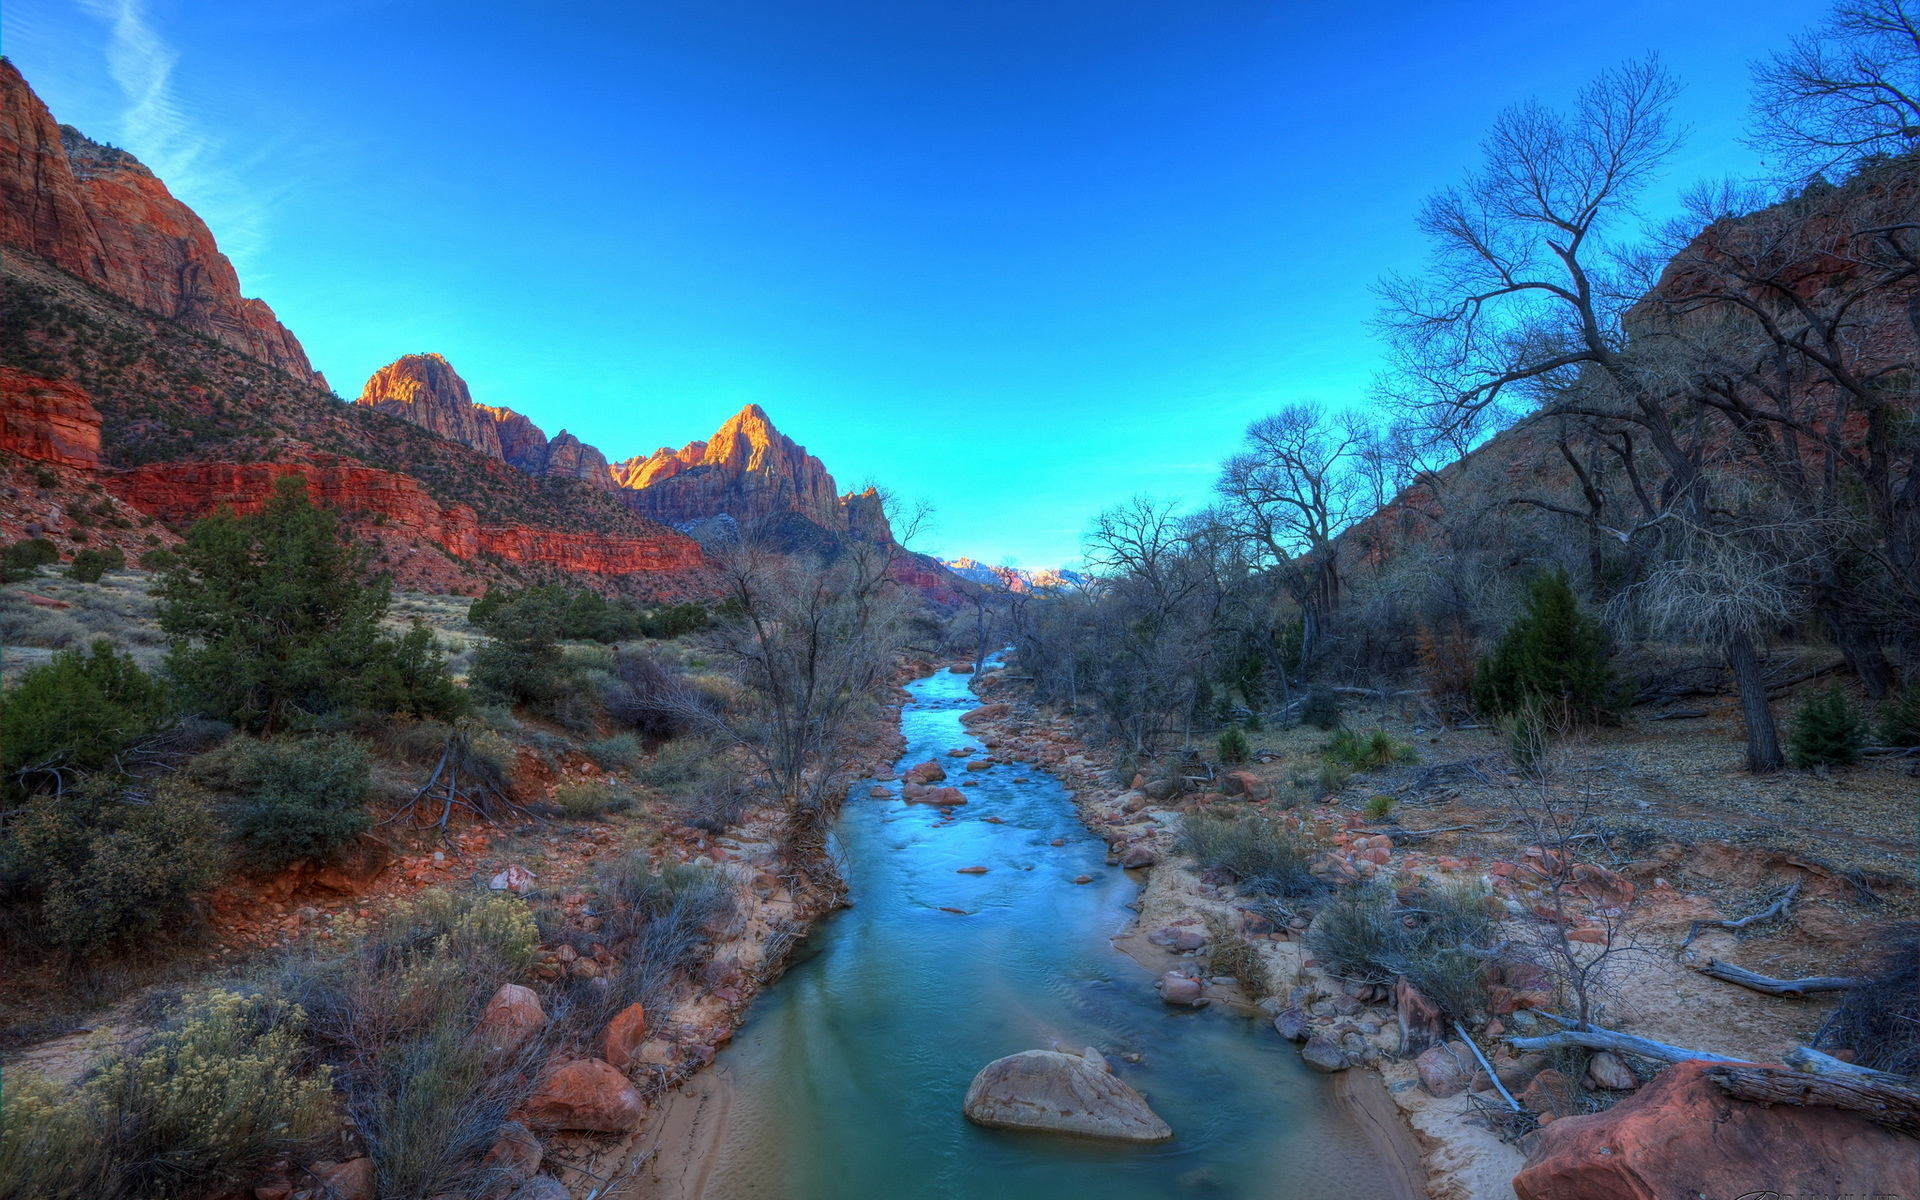 Fall Season Wallpapers For Iphone Zion National Park Wallpapers Hd Pixelstalk Net